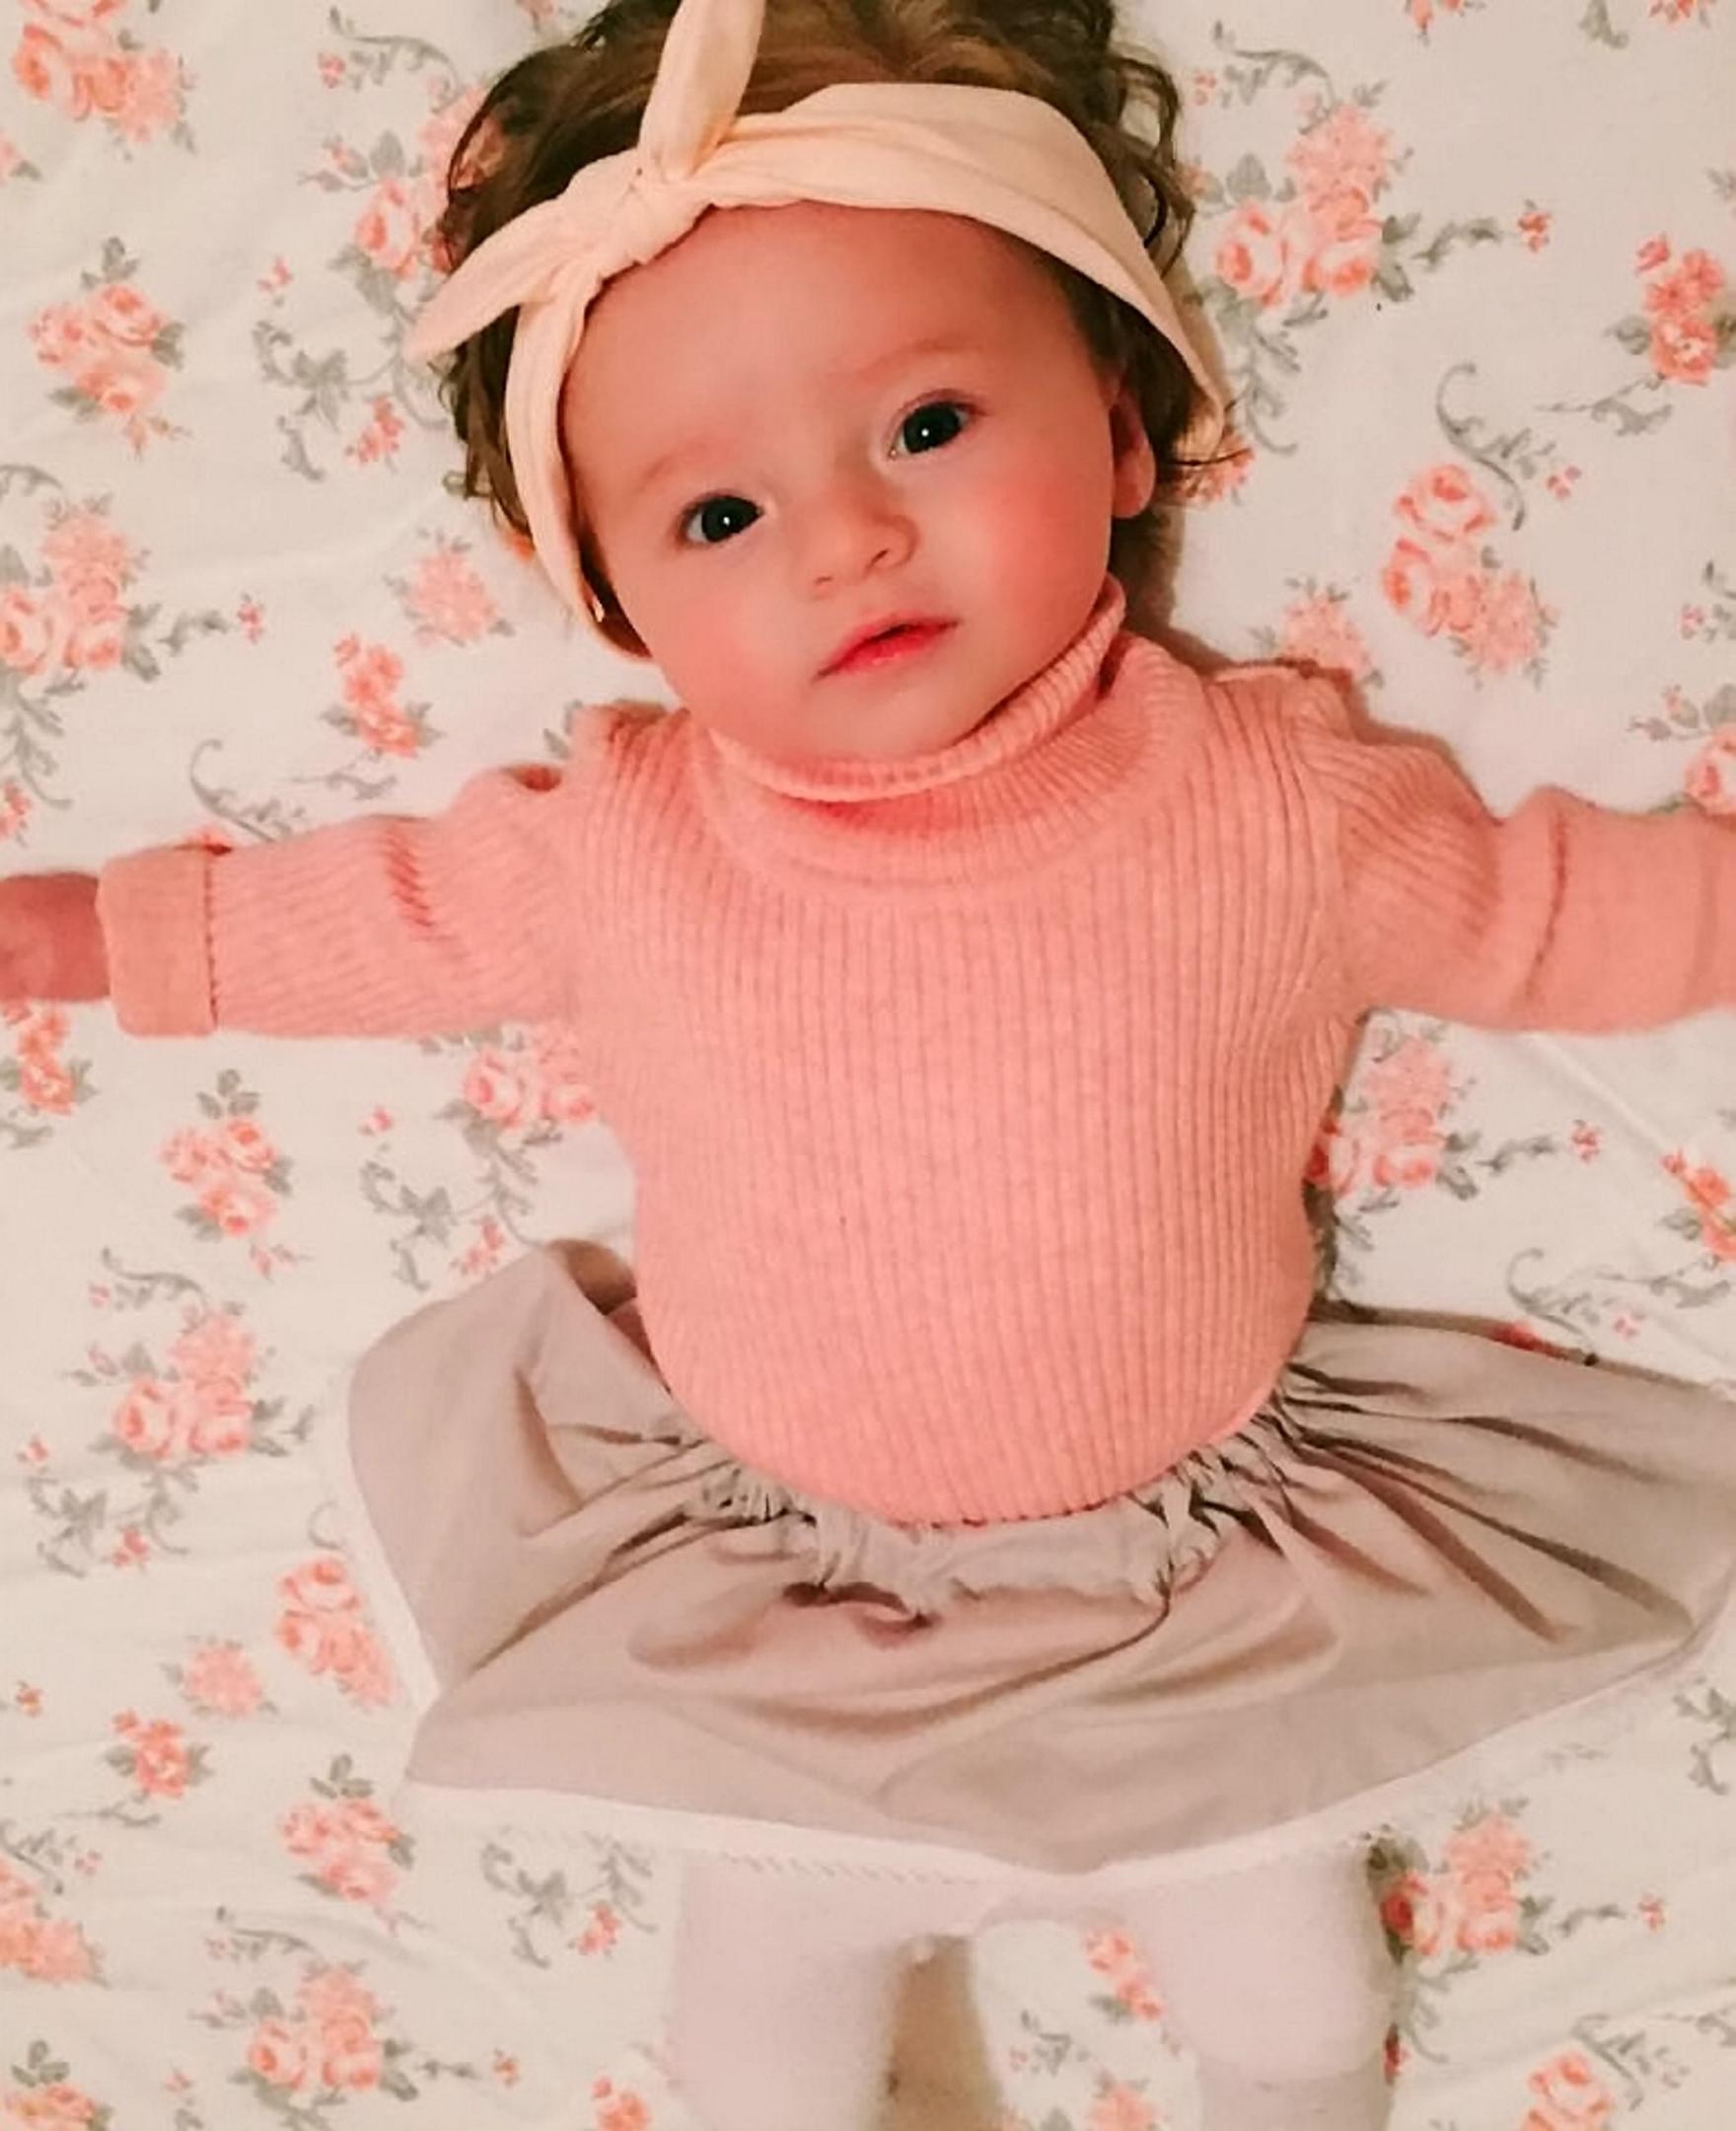 Mya Byrne on her mother Amy McIndewars' Instagram account